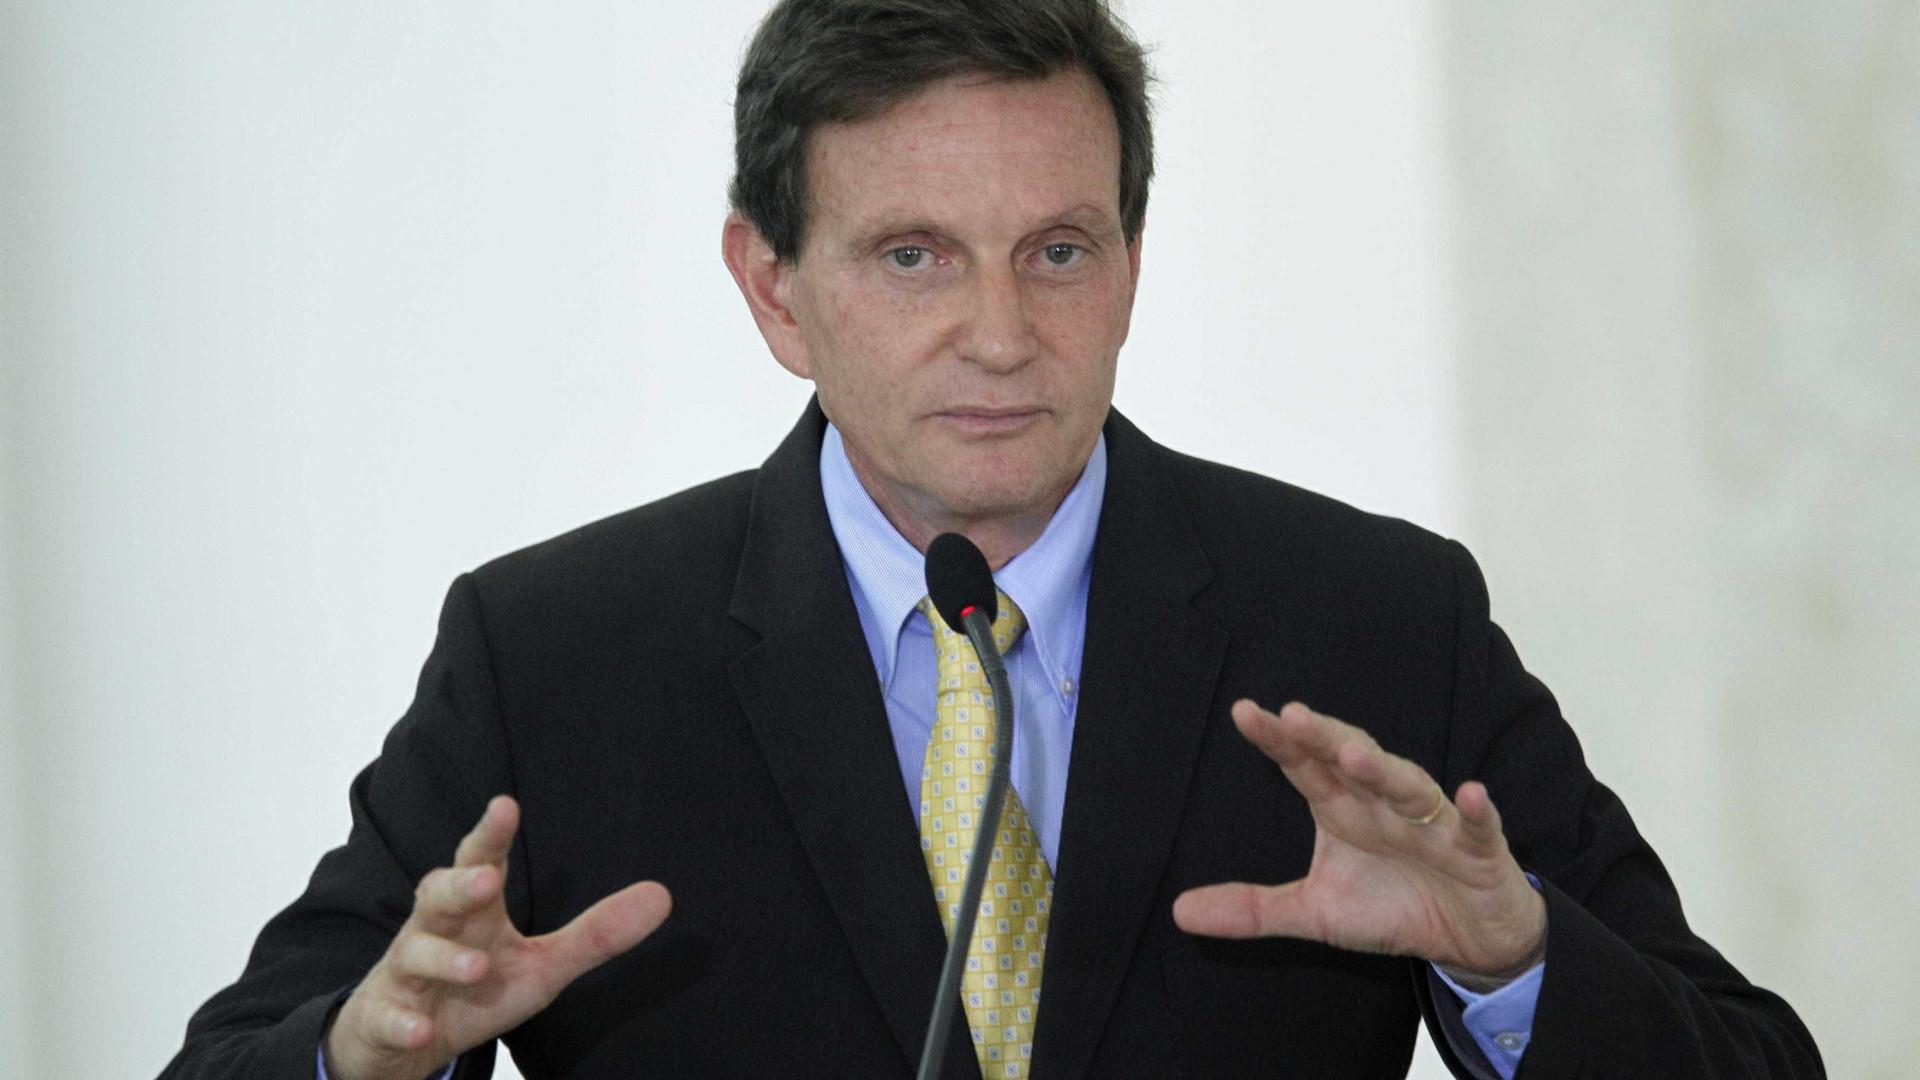 Prefeitura do Rio anuncia venda da folha de pagamento dos servidores